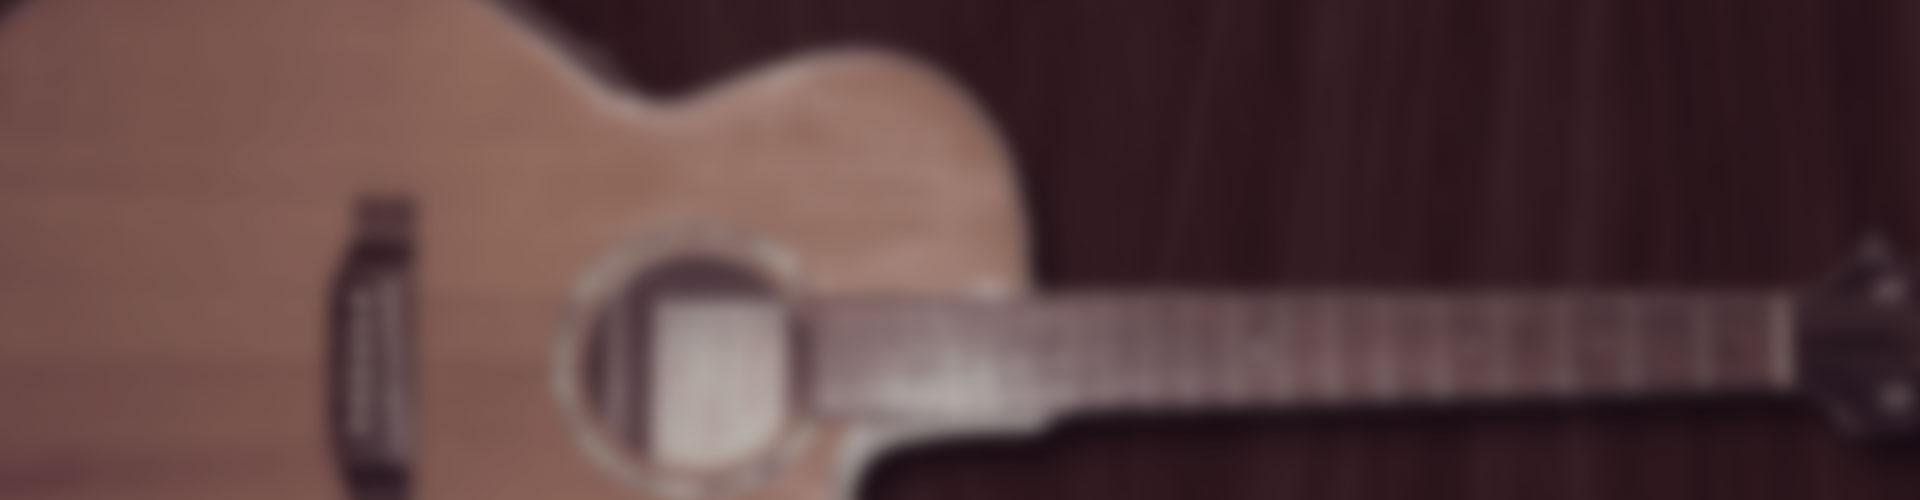 Modest Guitar Free for Kontakt 5 - Acoustic Guitar